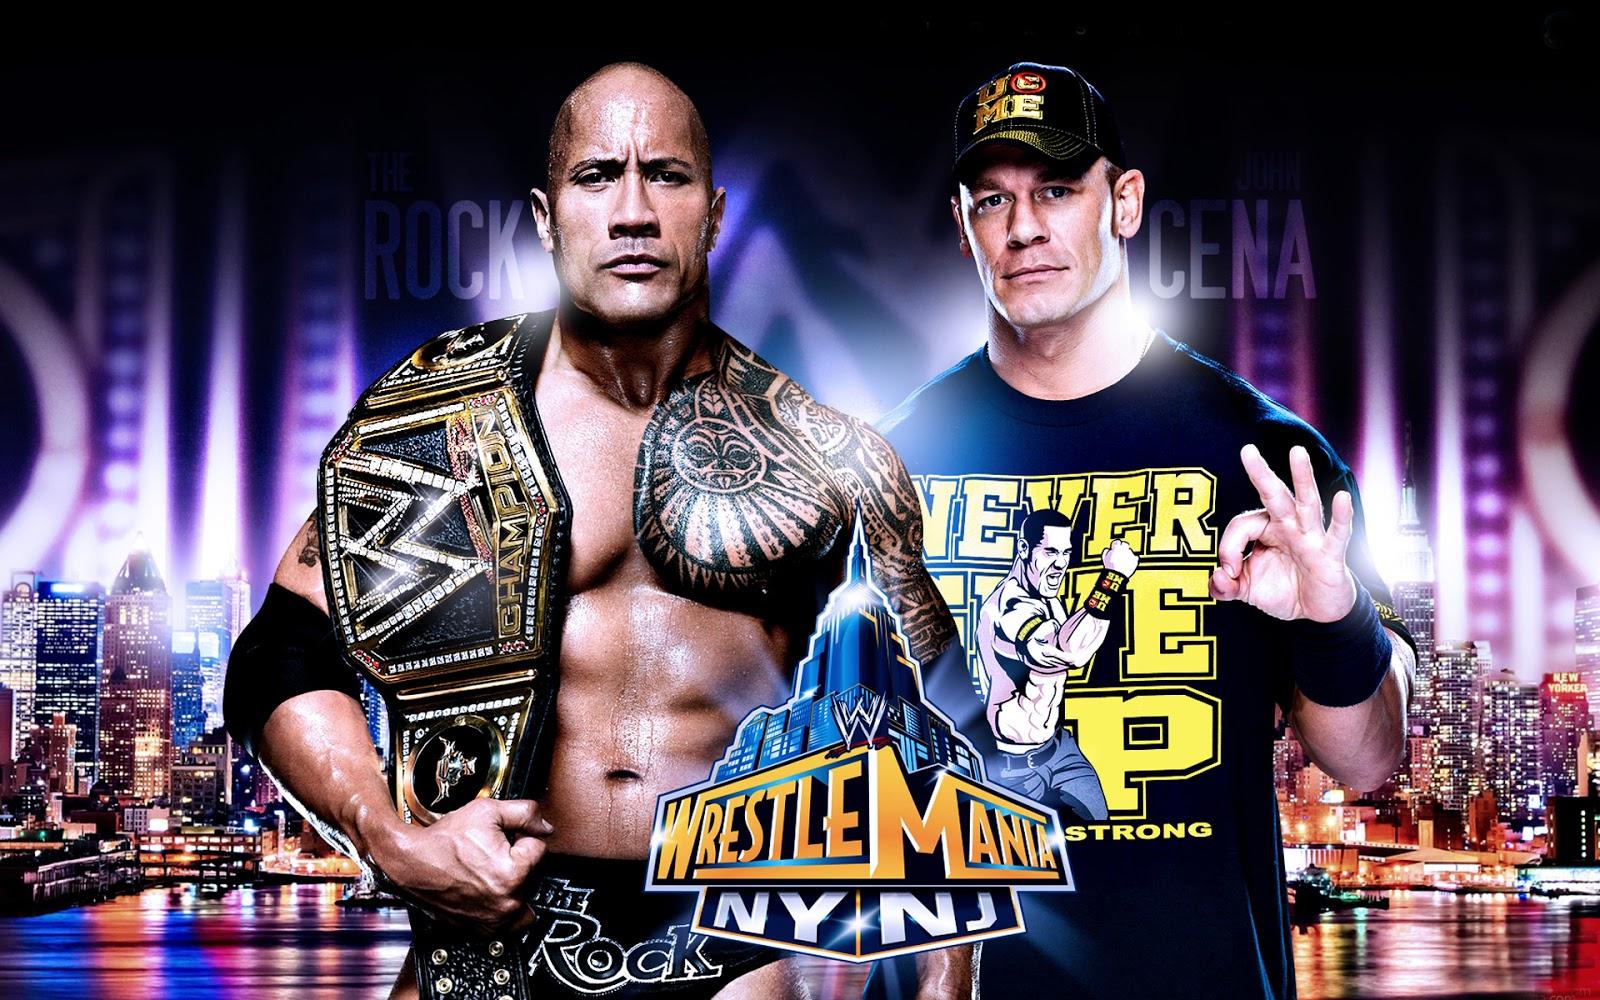 John Cena Wallpapers Vs The Rock WrestleMania